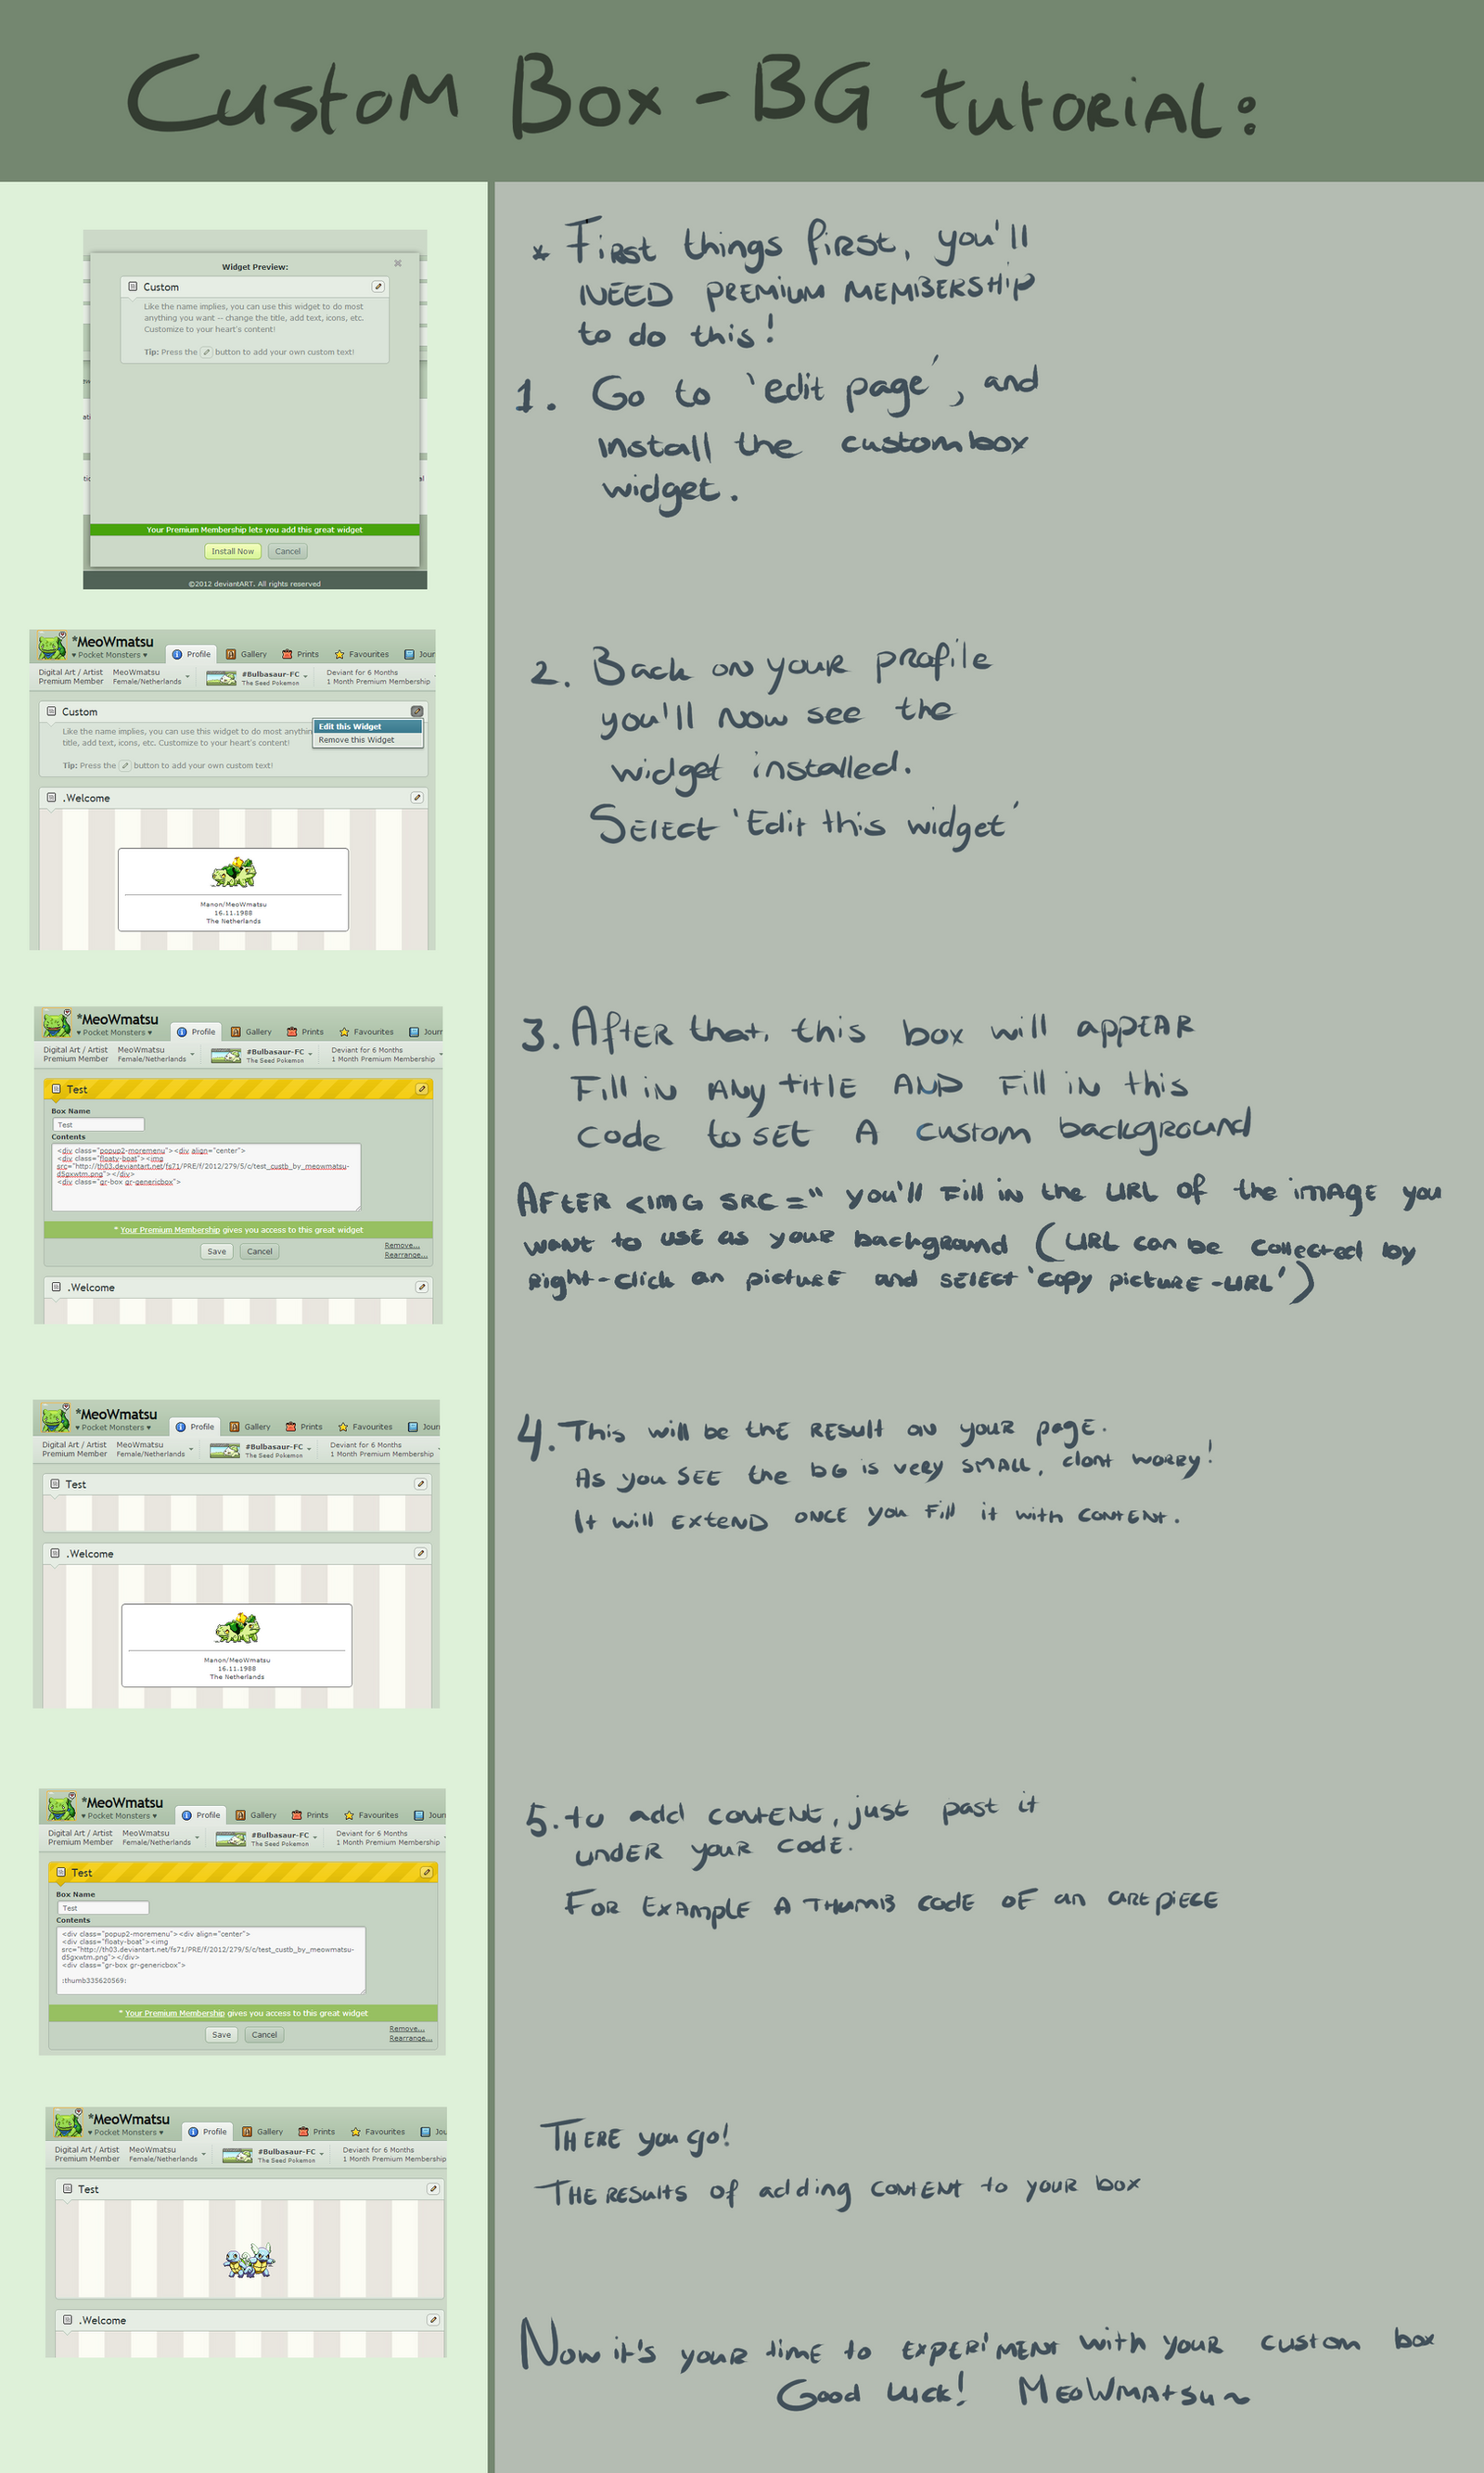 Custom box - Background tutorial by MeoWmatsu